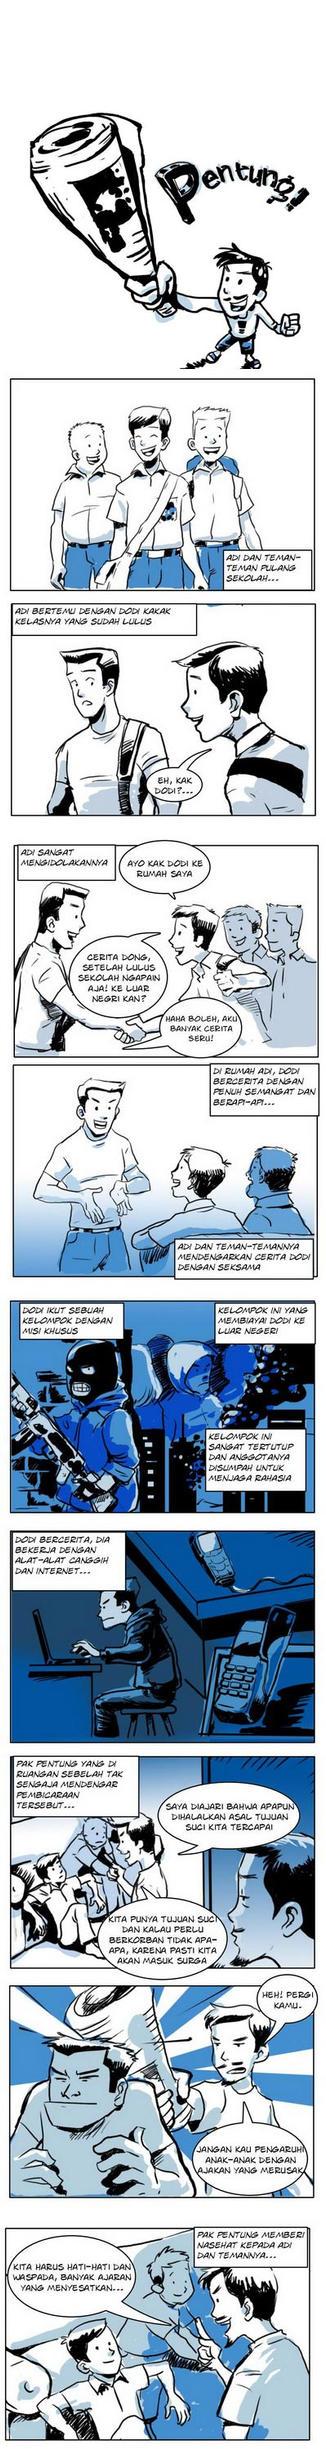 Indonesia Waspada 3 by terapikomik